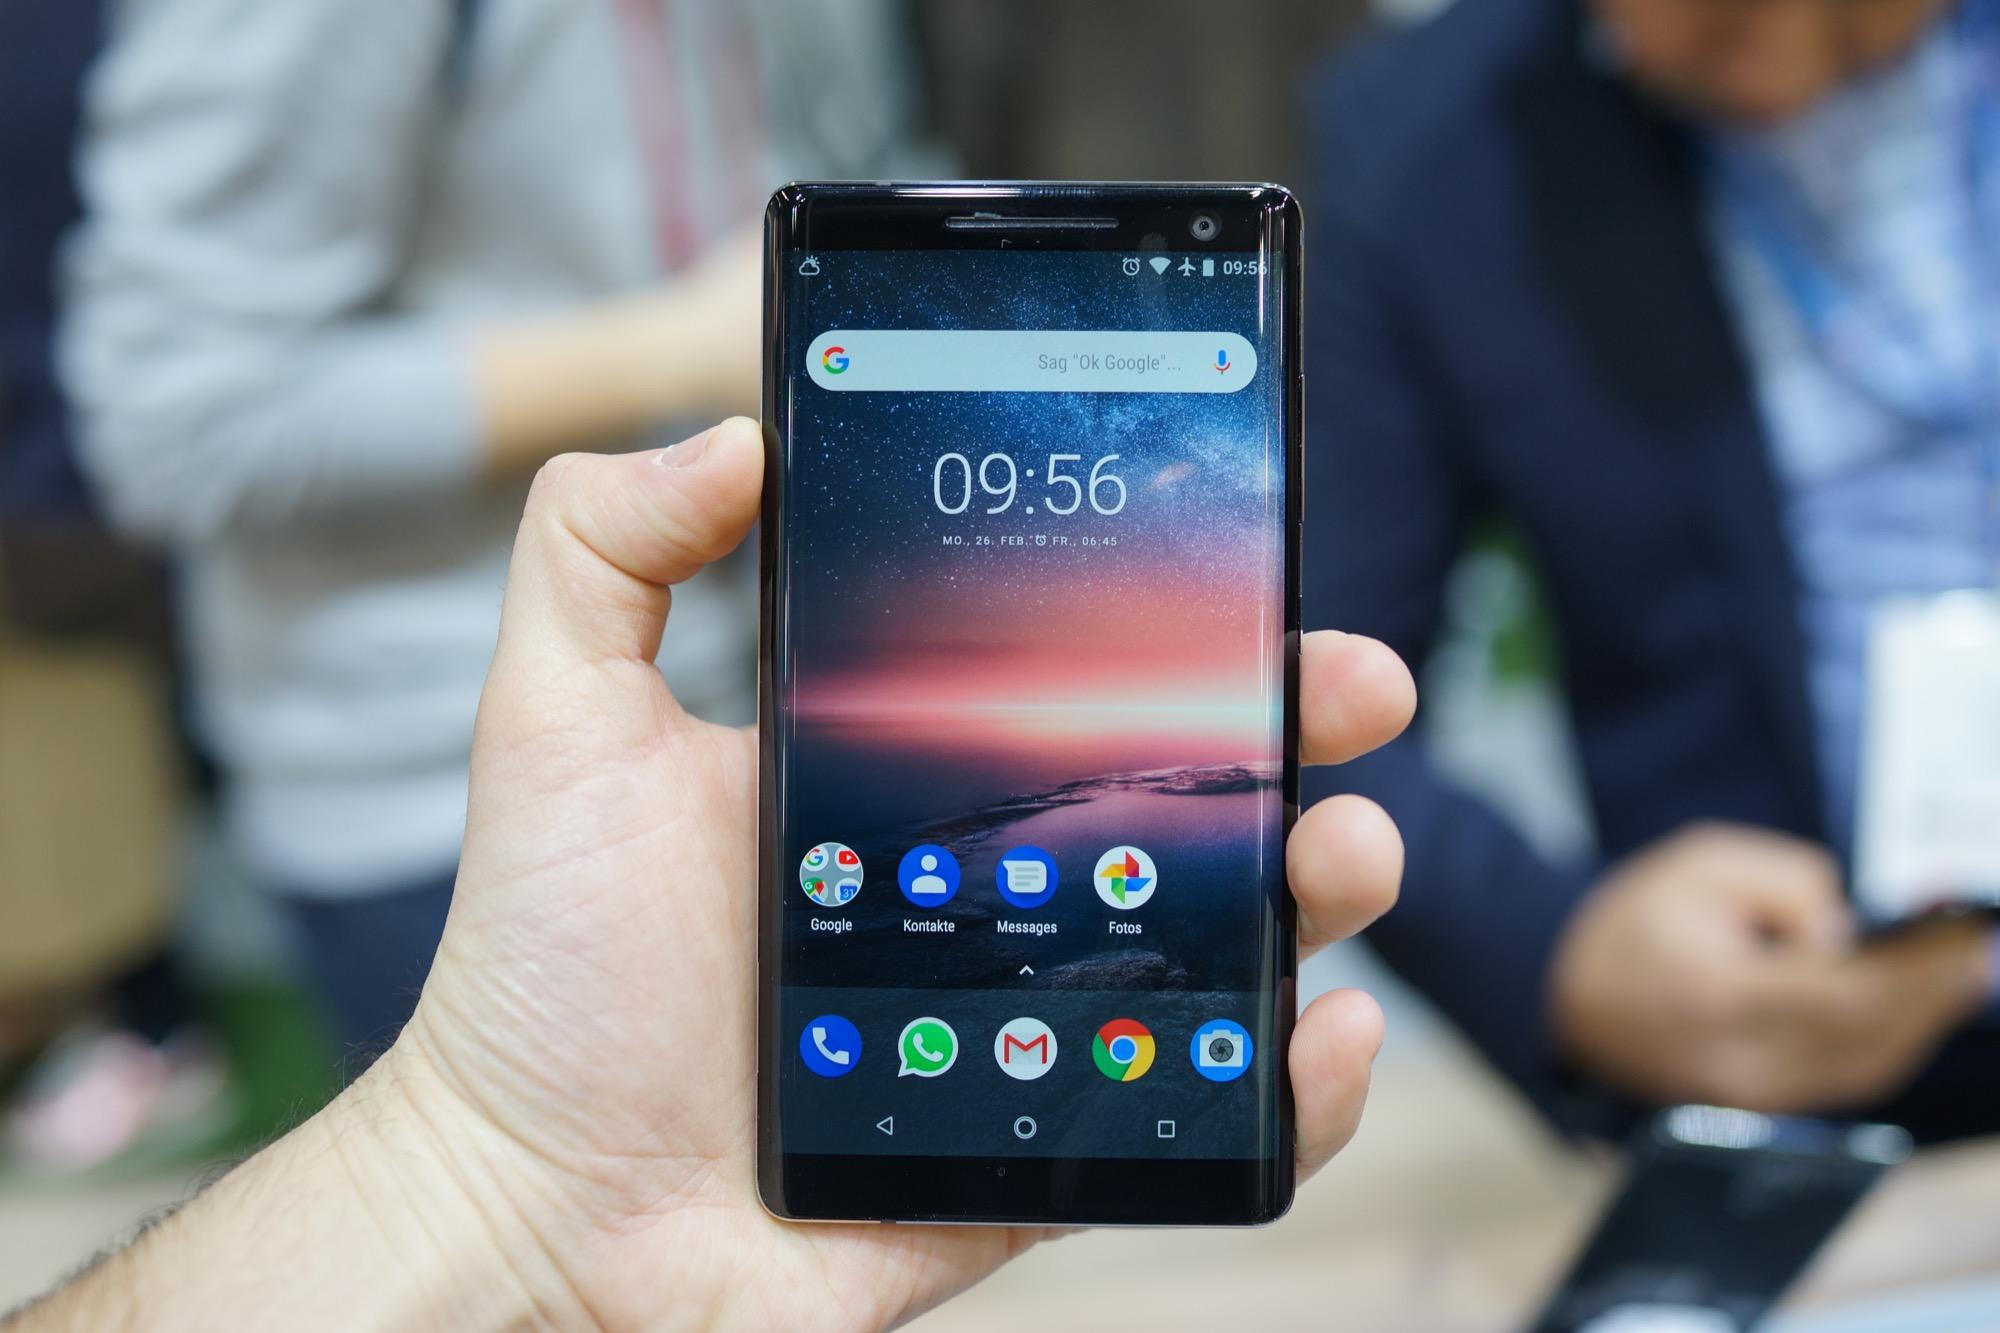 Le Nokia 8 Sirocco est impressionnant en main